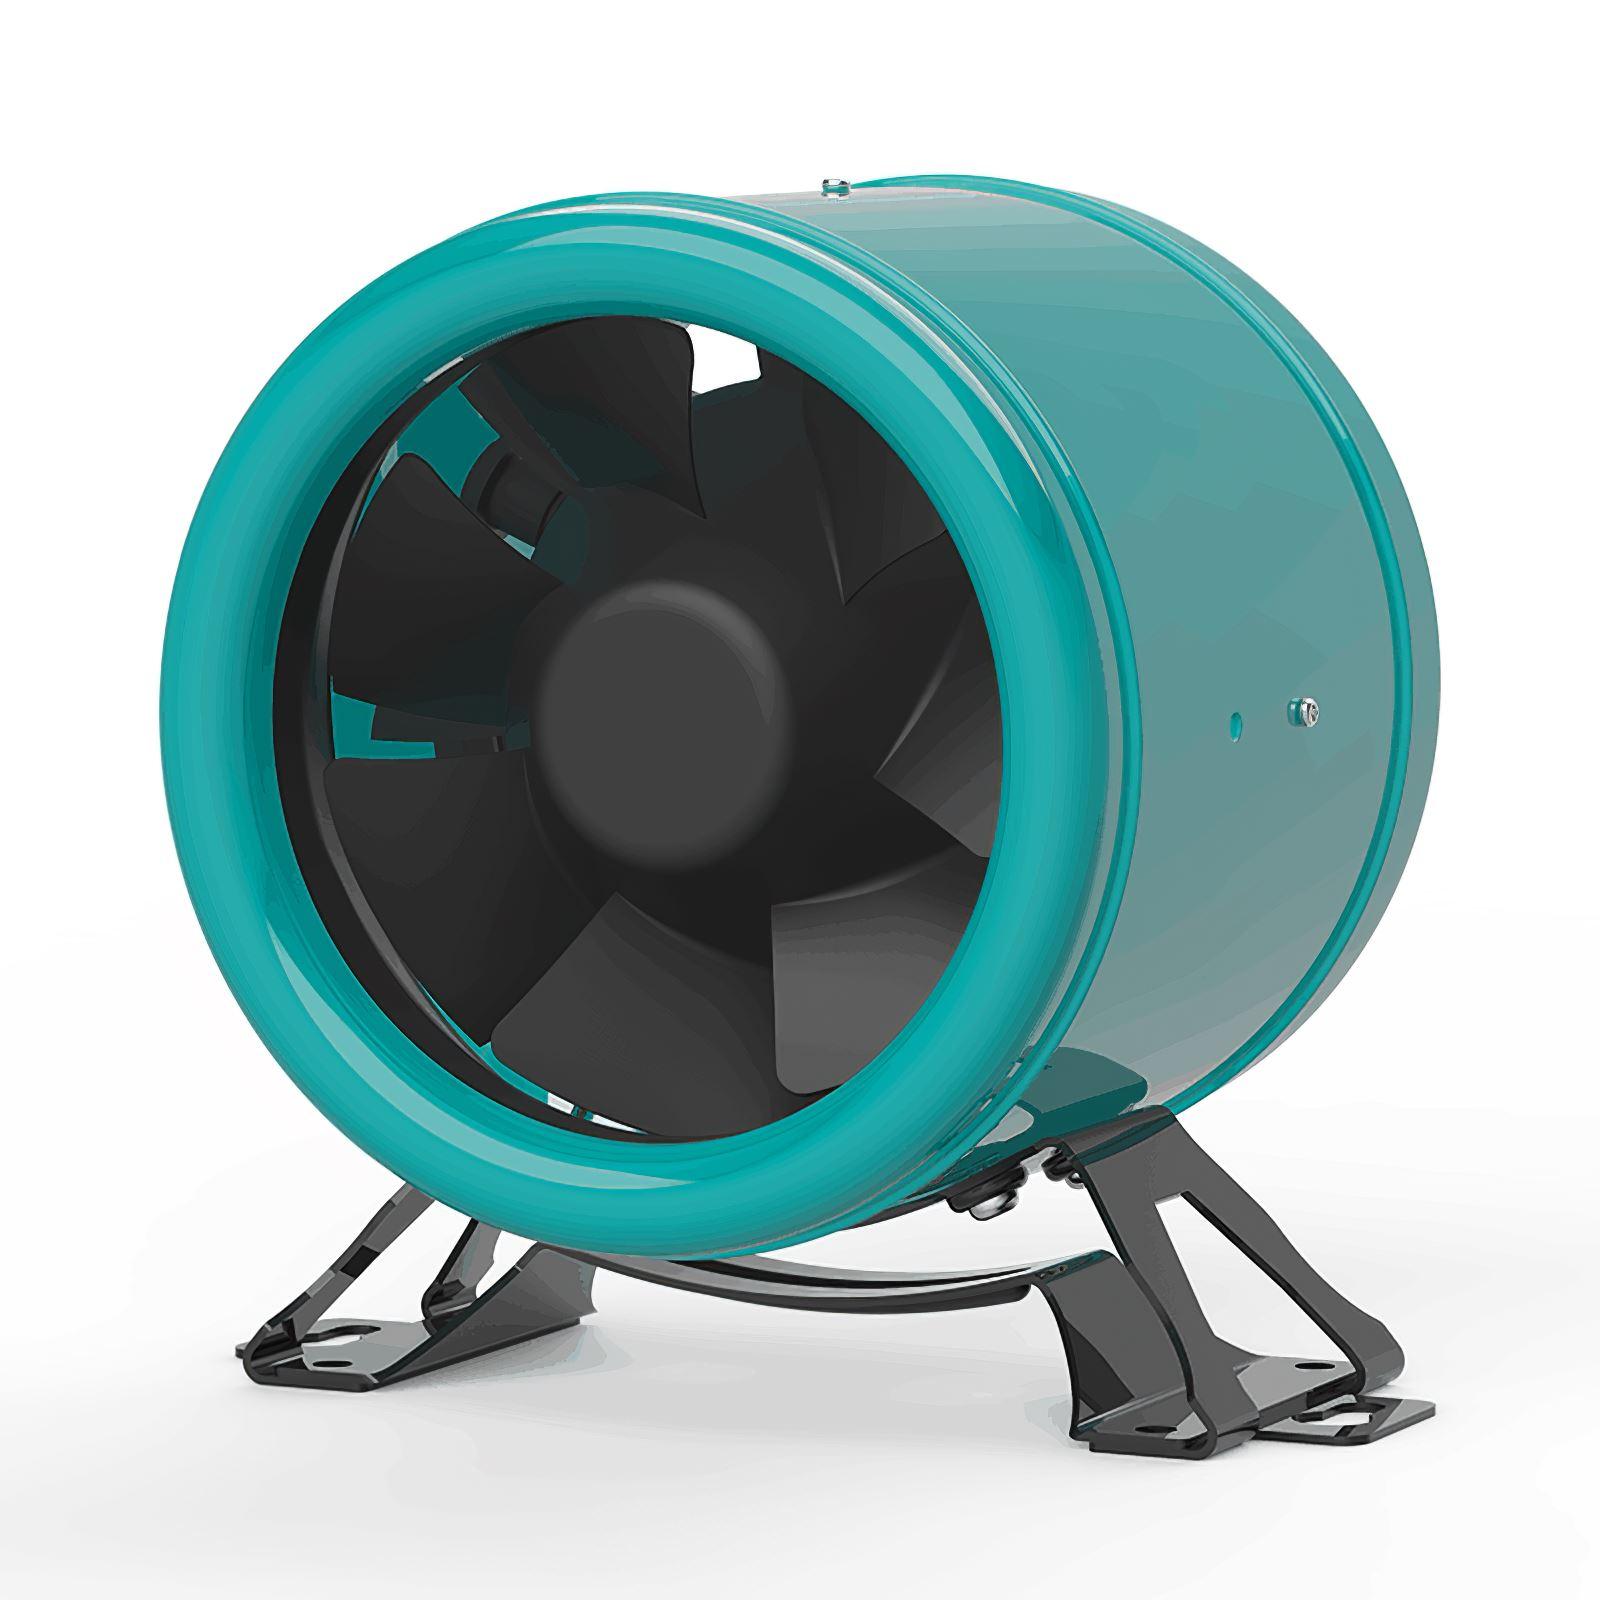 6 Inch Inline Duct Fan Exhaust Fan Adjustable Speed 5000rpm Garden Air Pipe Ventilation 220V-240V Digital Display Controller enlarge